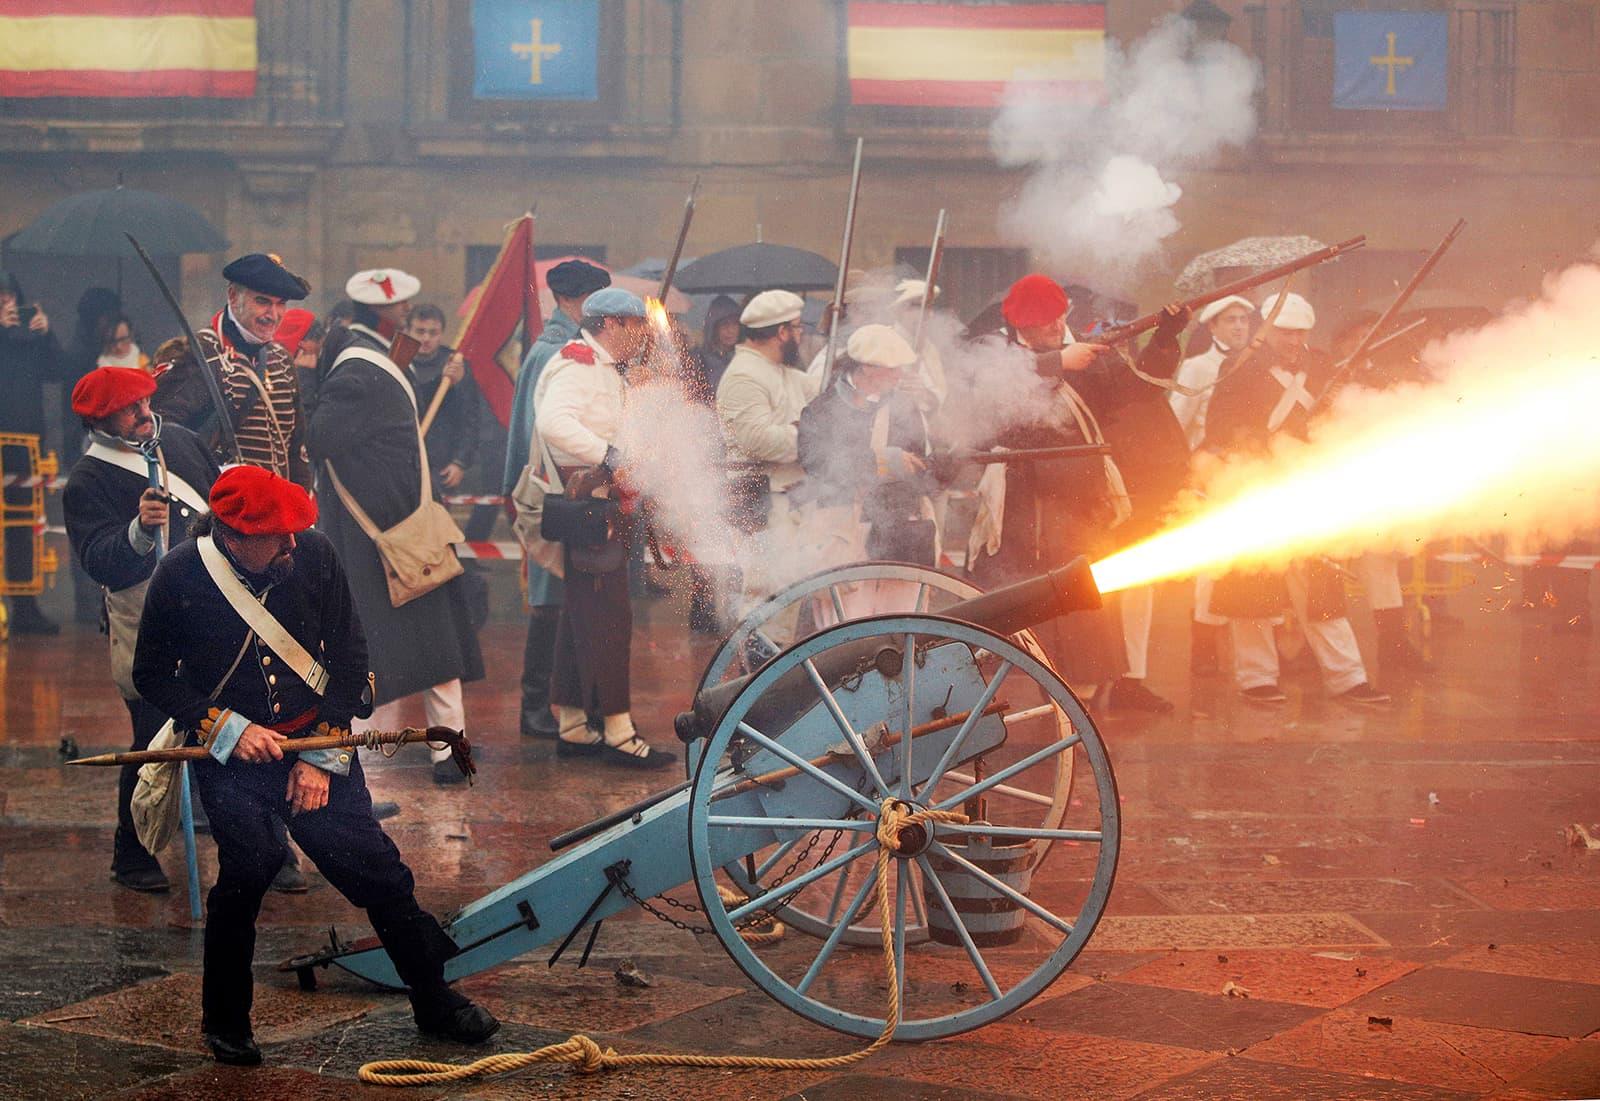 Commemoració de les Guerres Carlines a Oviedo el 2019. Fotografia d'Alberto Morante. Efe.